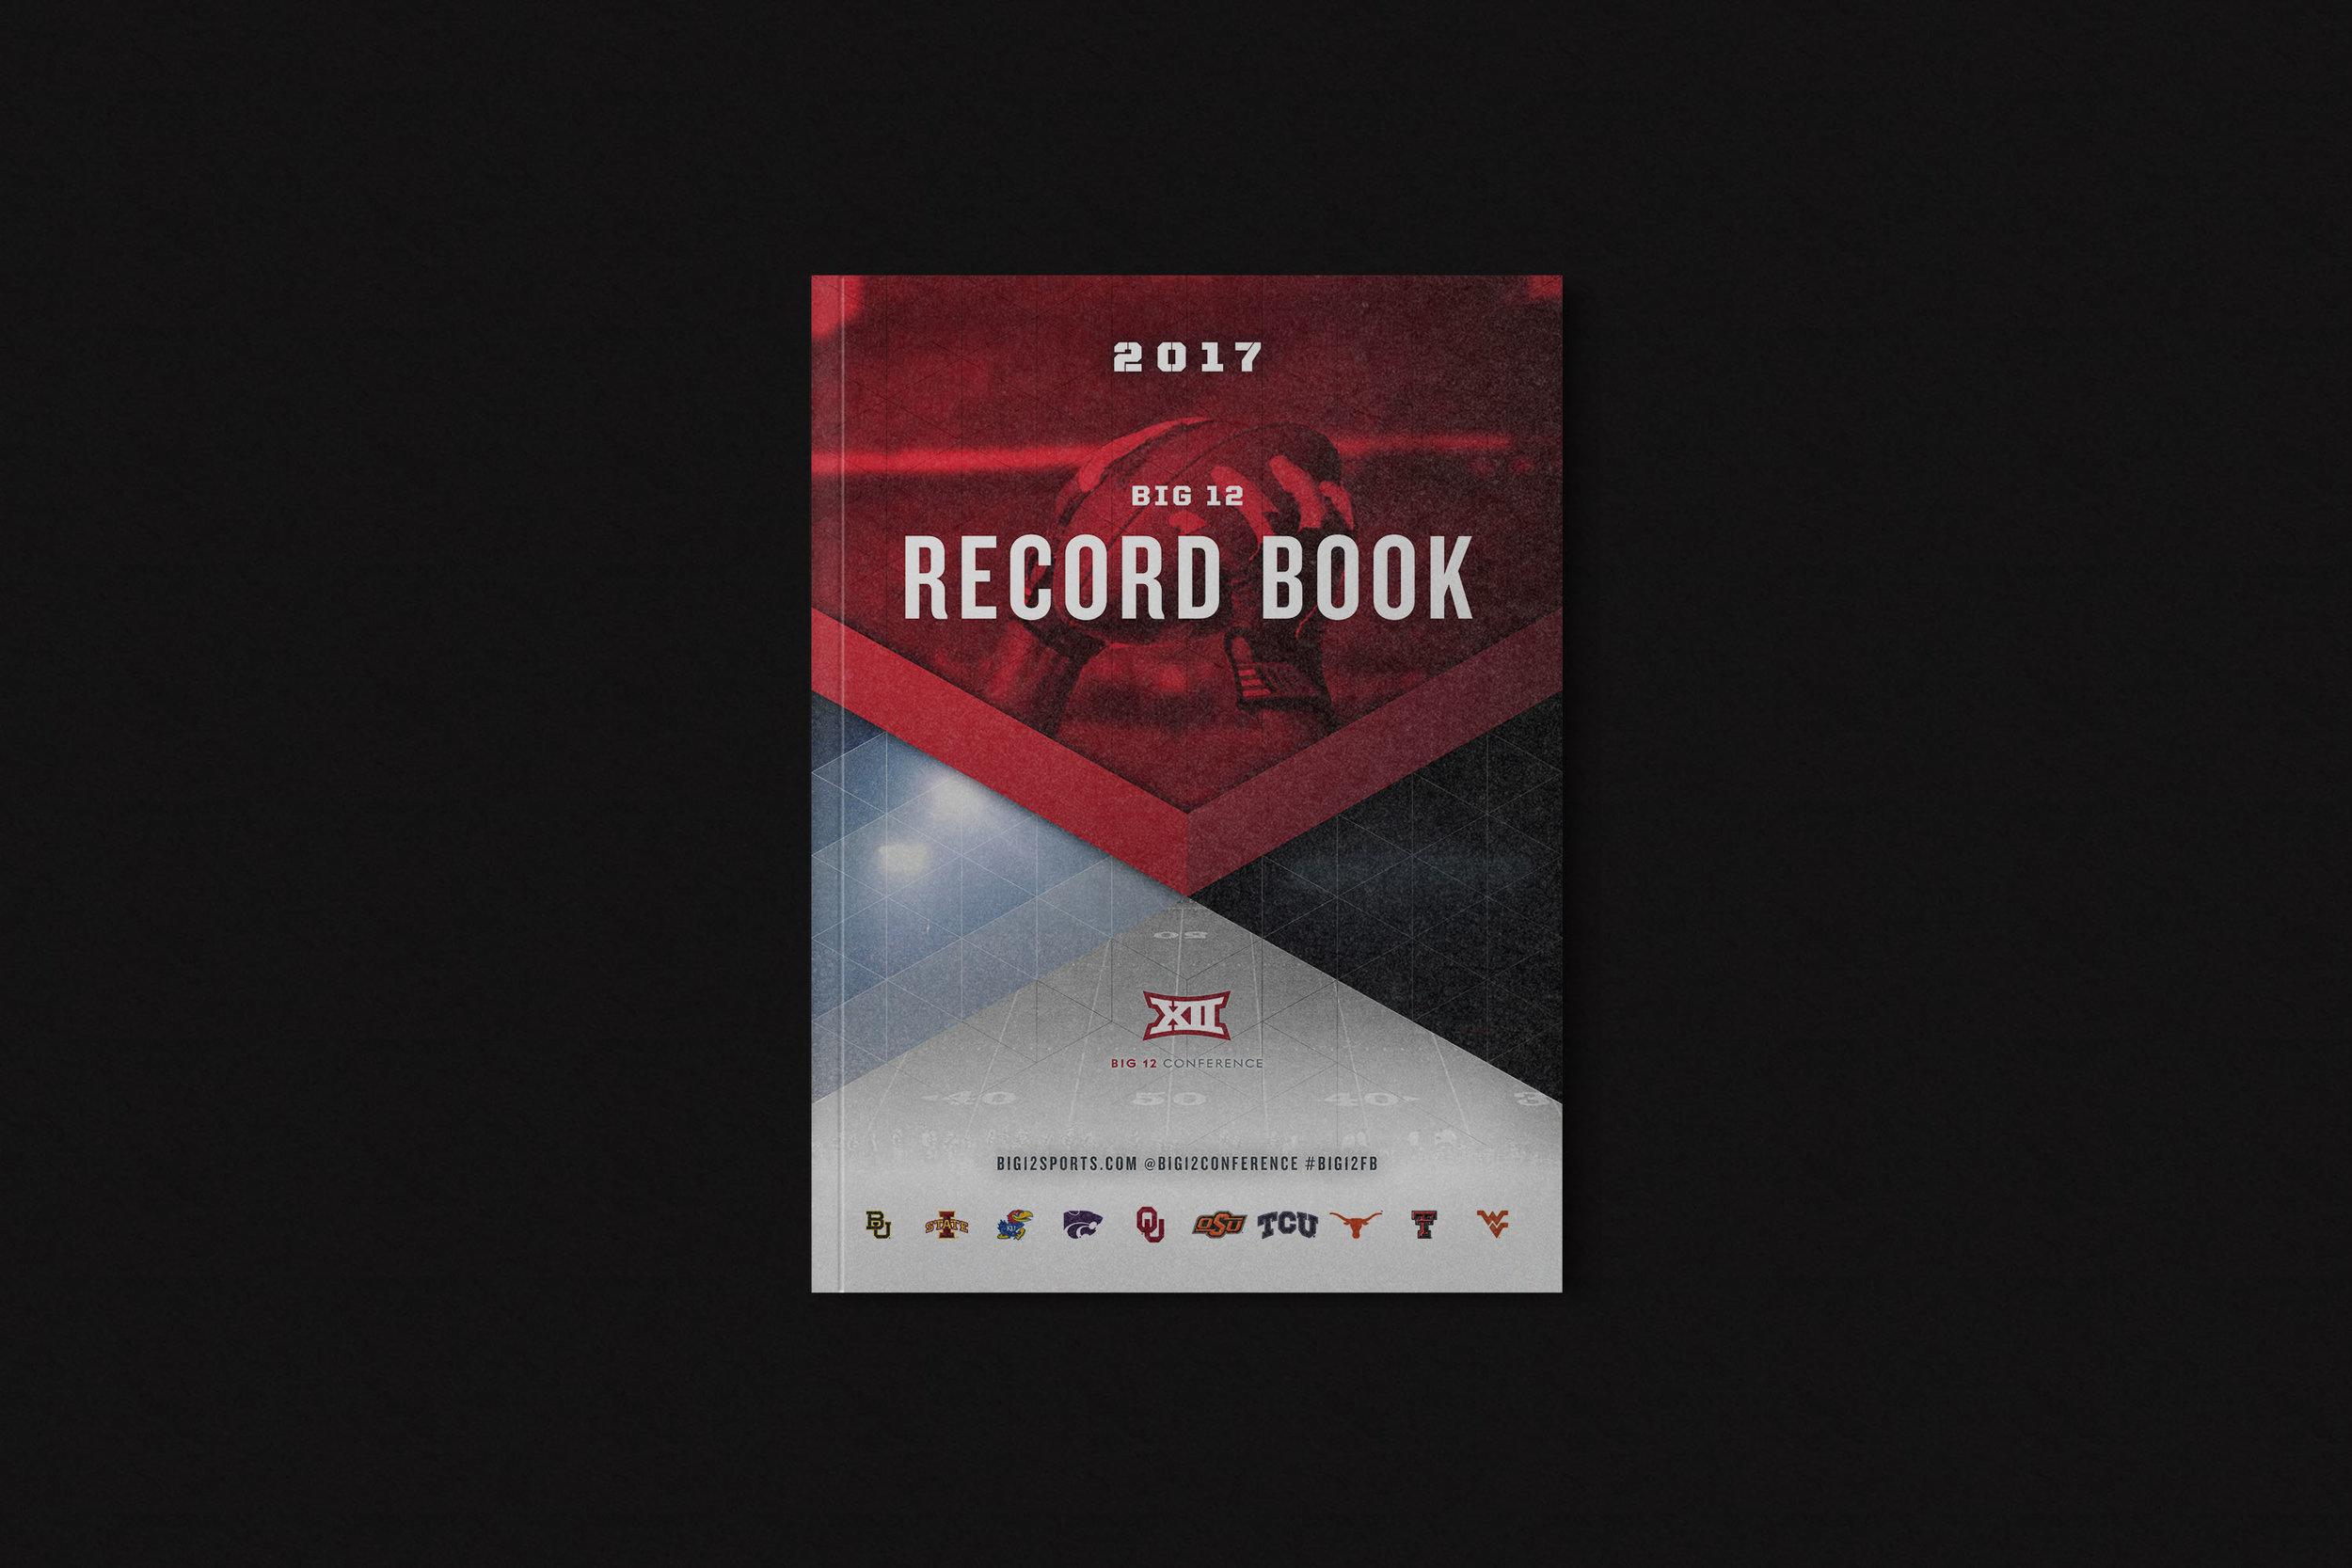 ronaldvillegas-big12-record-book.jpg